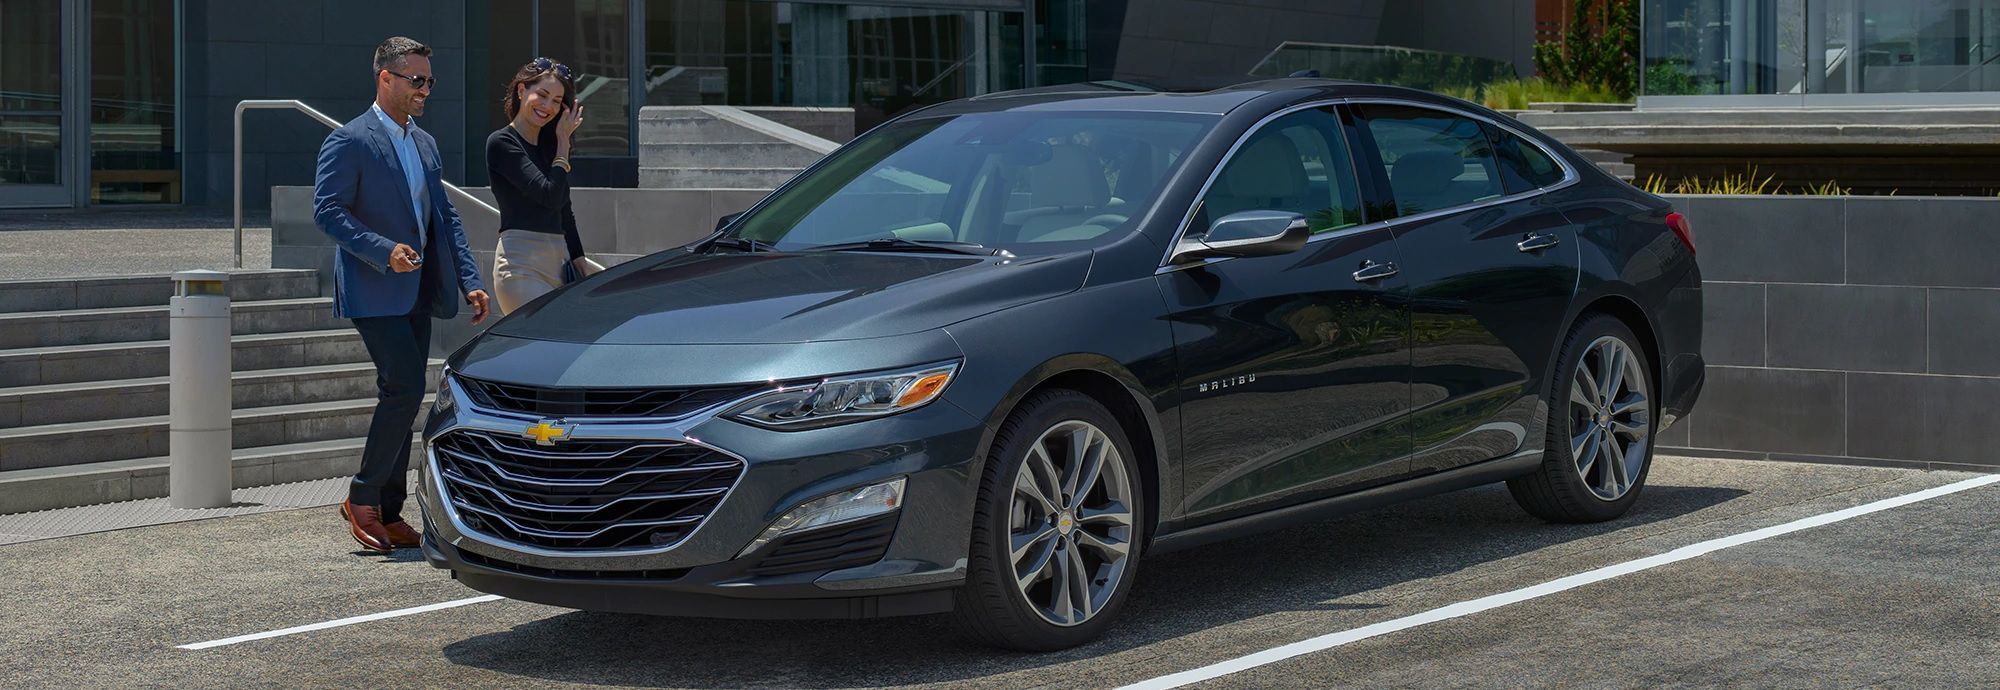 2019 Chevrolet Malibu Leasing near Homer Glen, IL